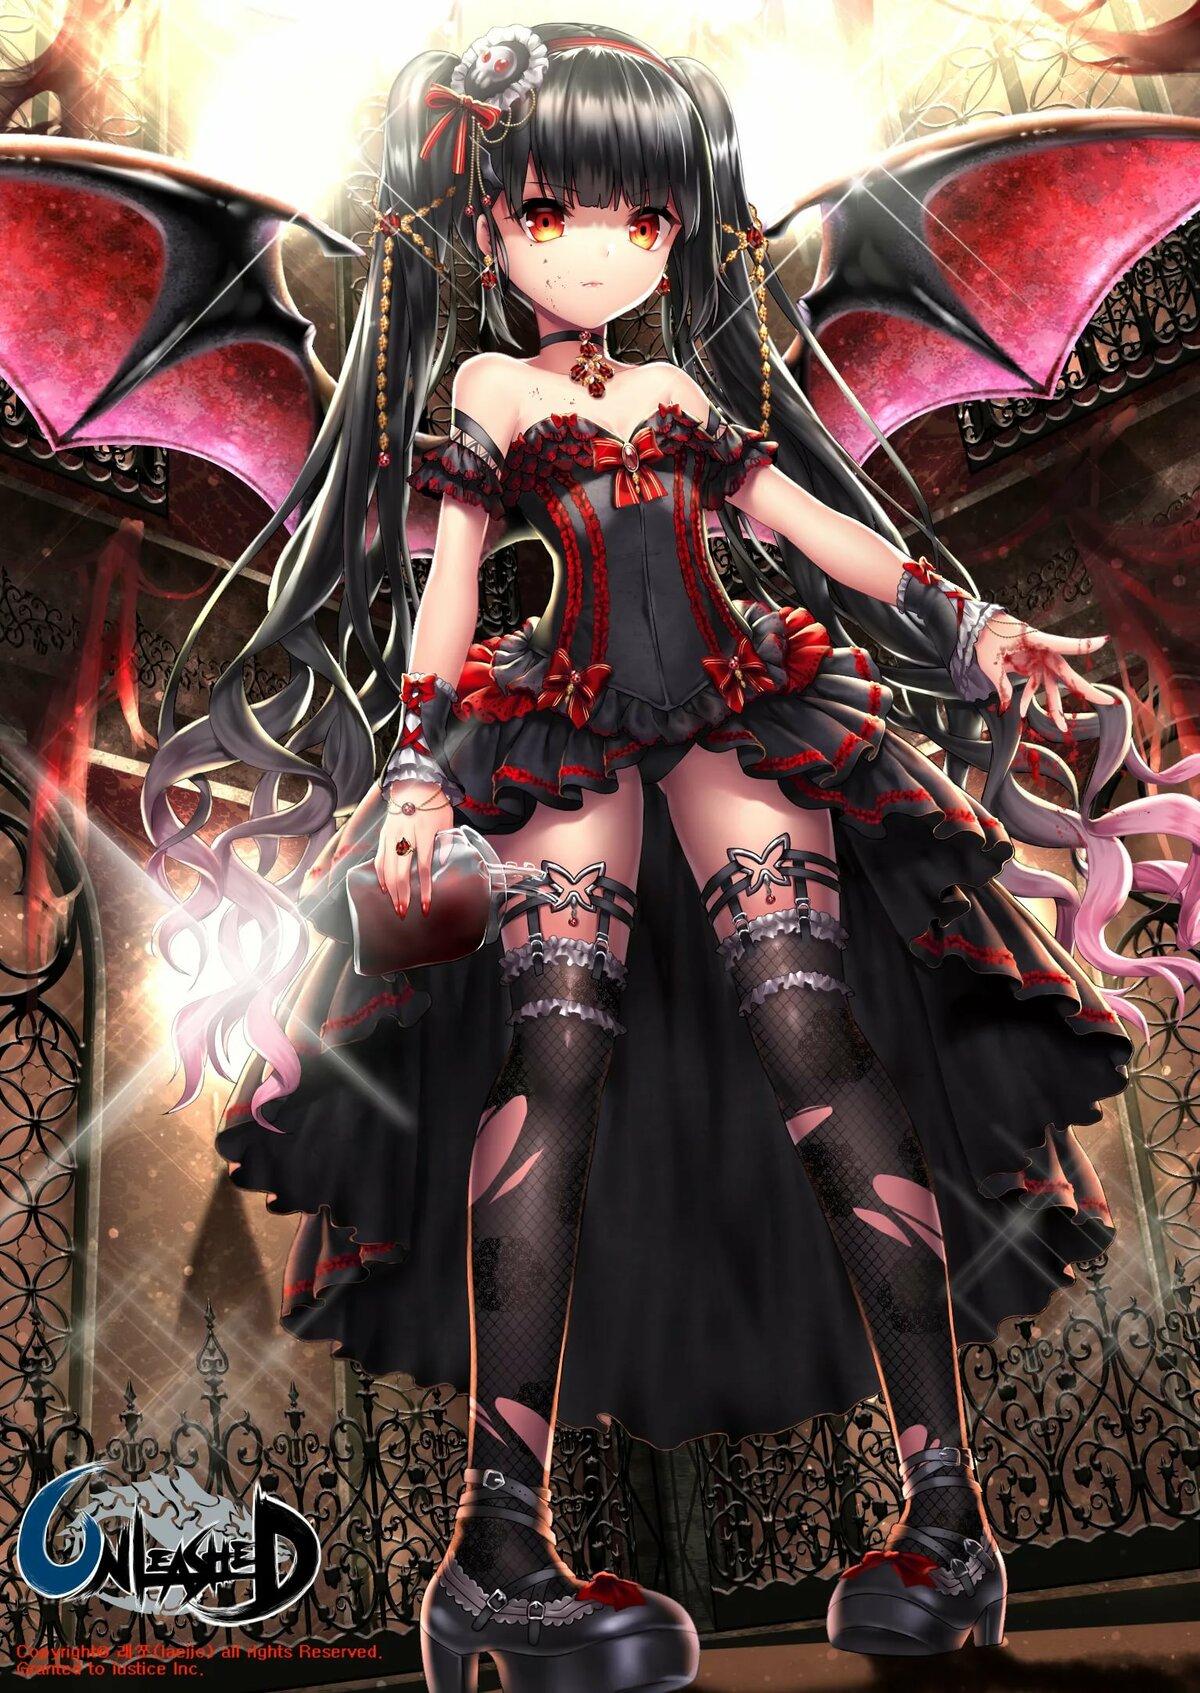 Картинка демон в юбке